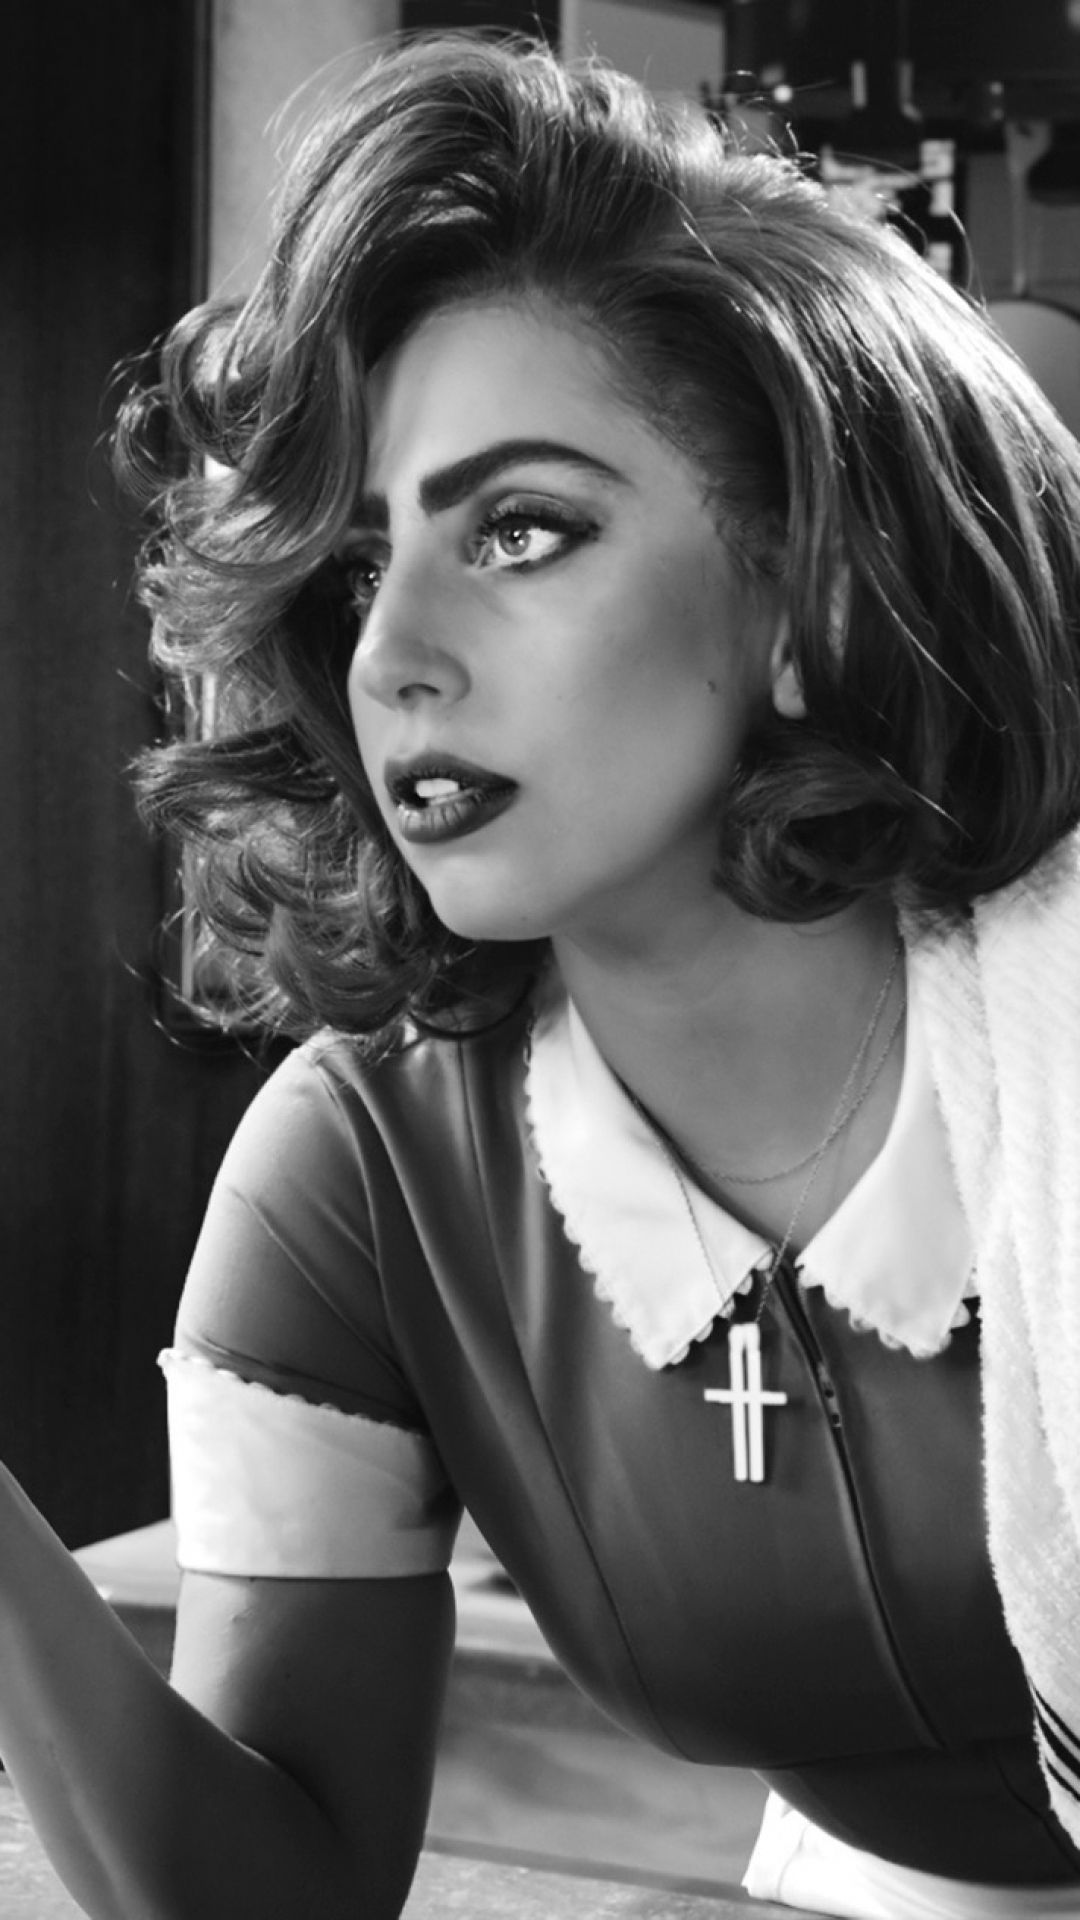 Download Wallpaper 1080x1920 Sin City A Dame To Kill For Lady Gaga Bertha Black White Sony Xperia Z1 Zl Z Samsun Lady Gaga Lady Gaga Black And White Lady